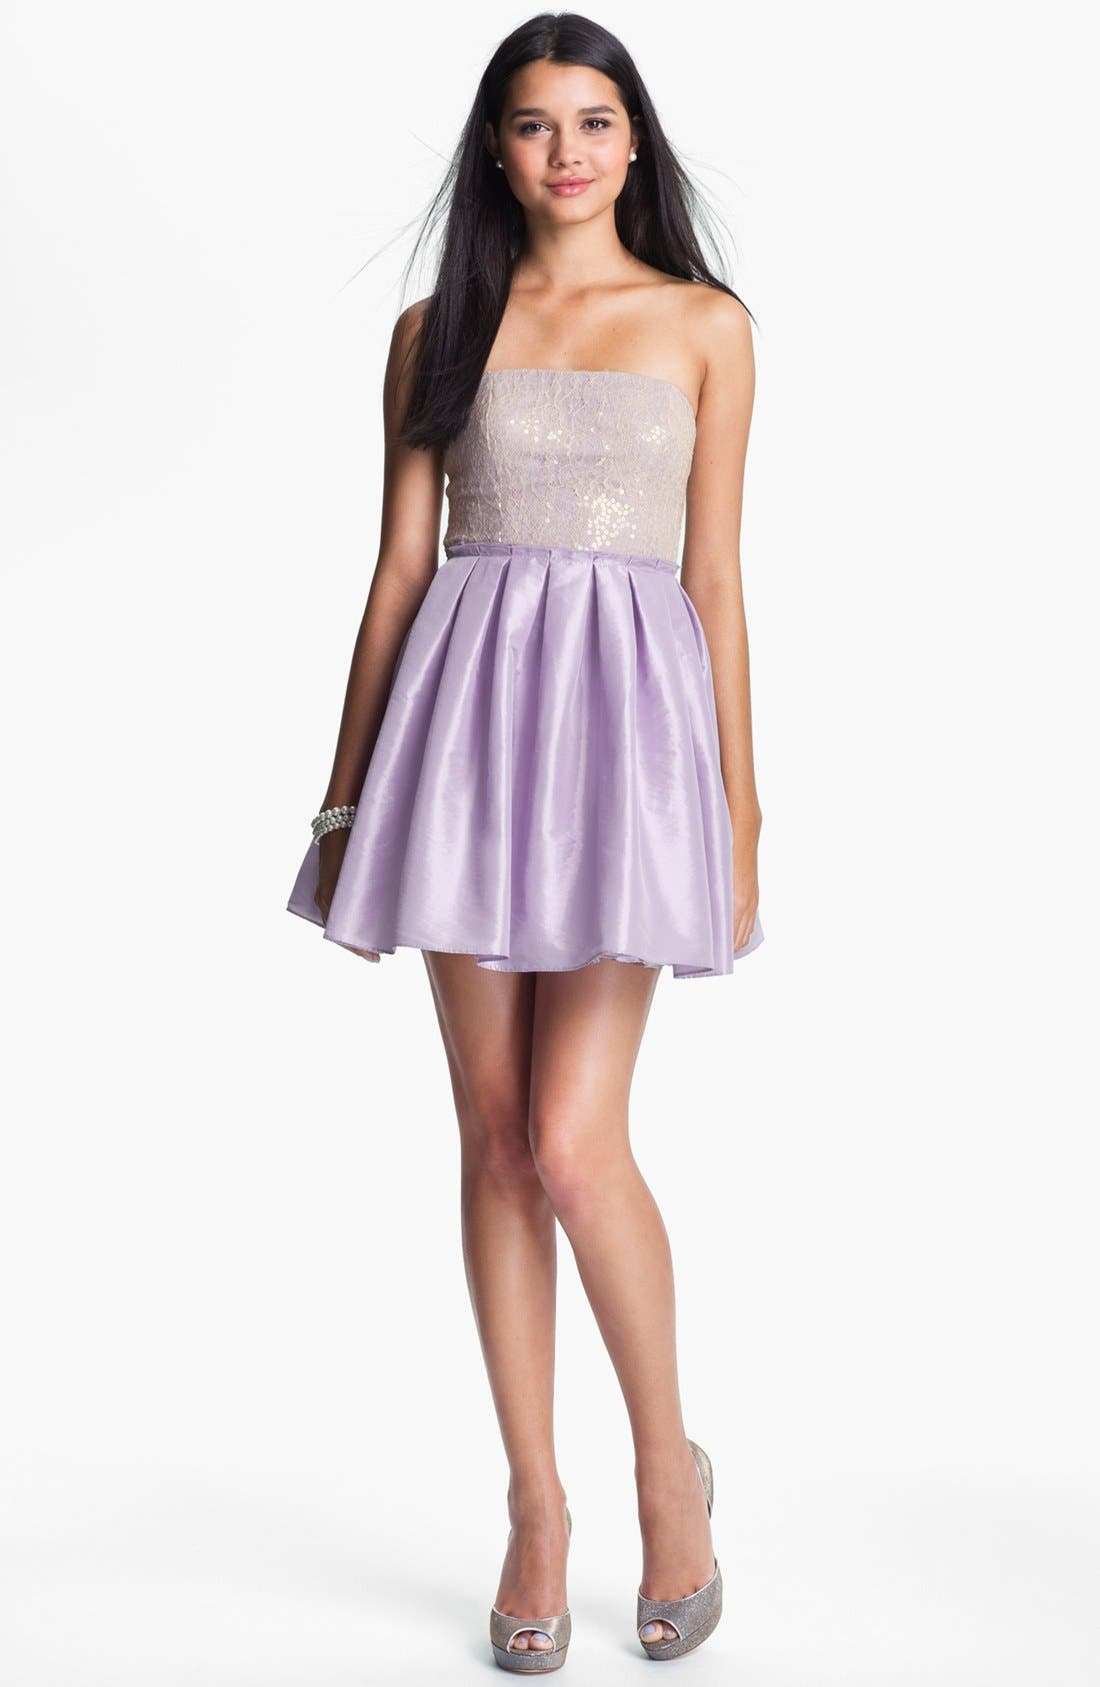 Alternate Image 1 Selected - Way-In Embellished Ballerina Dress (Juniors)